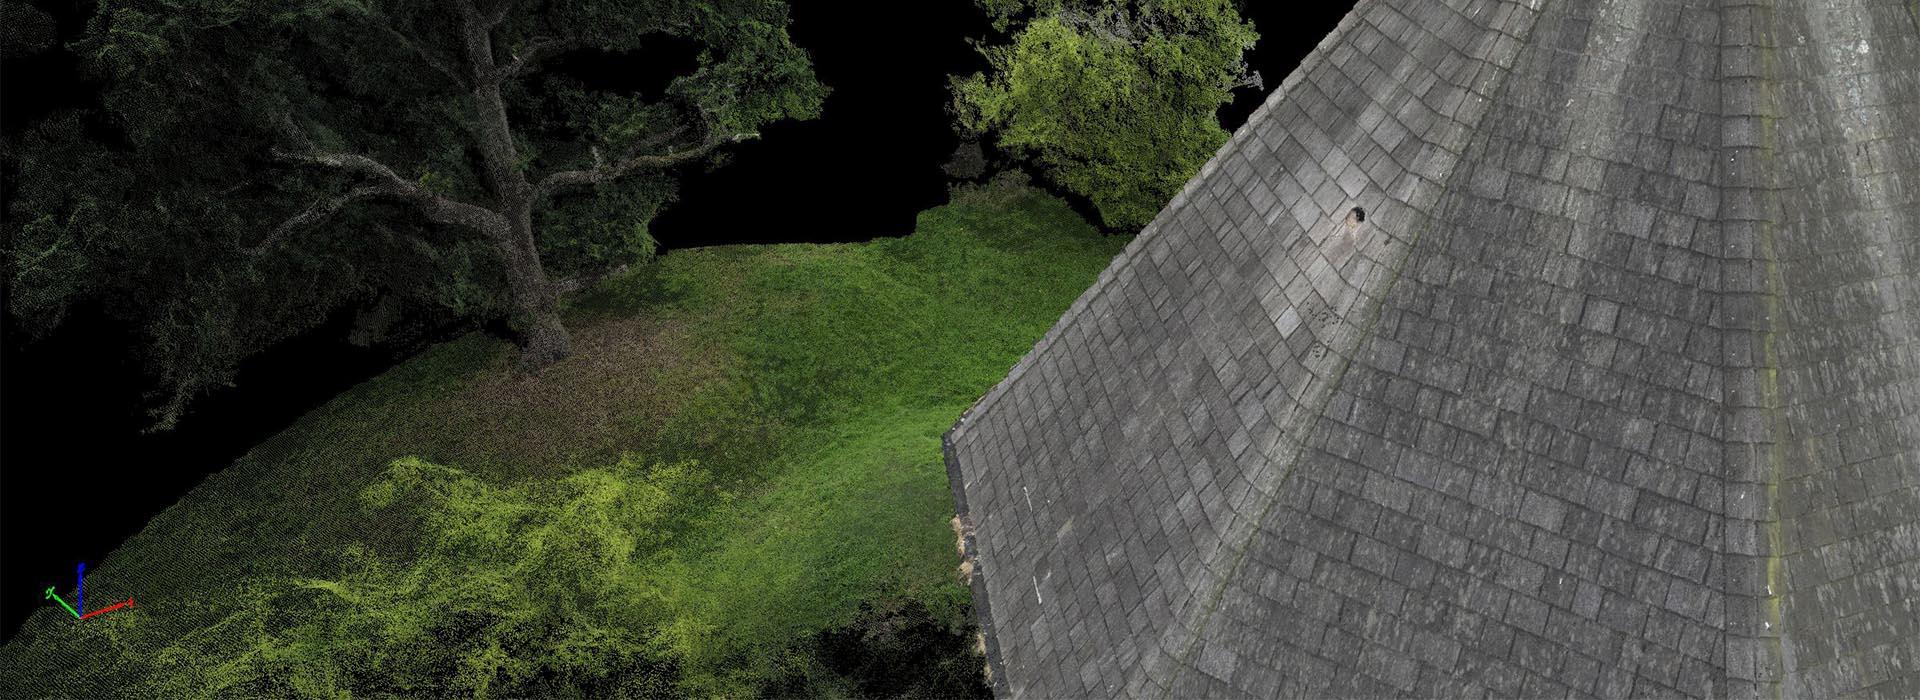 Uav survey of building and vegetation - Vision Engineering